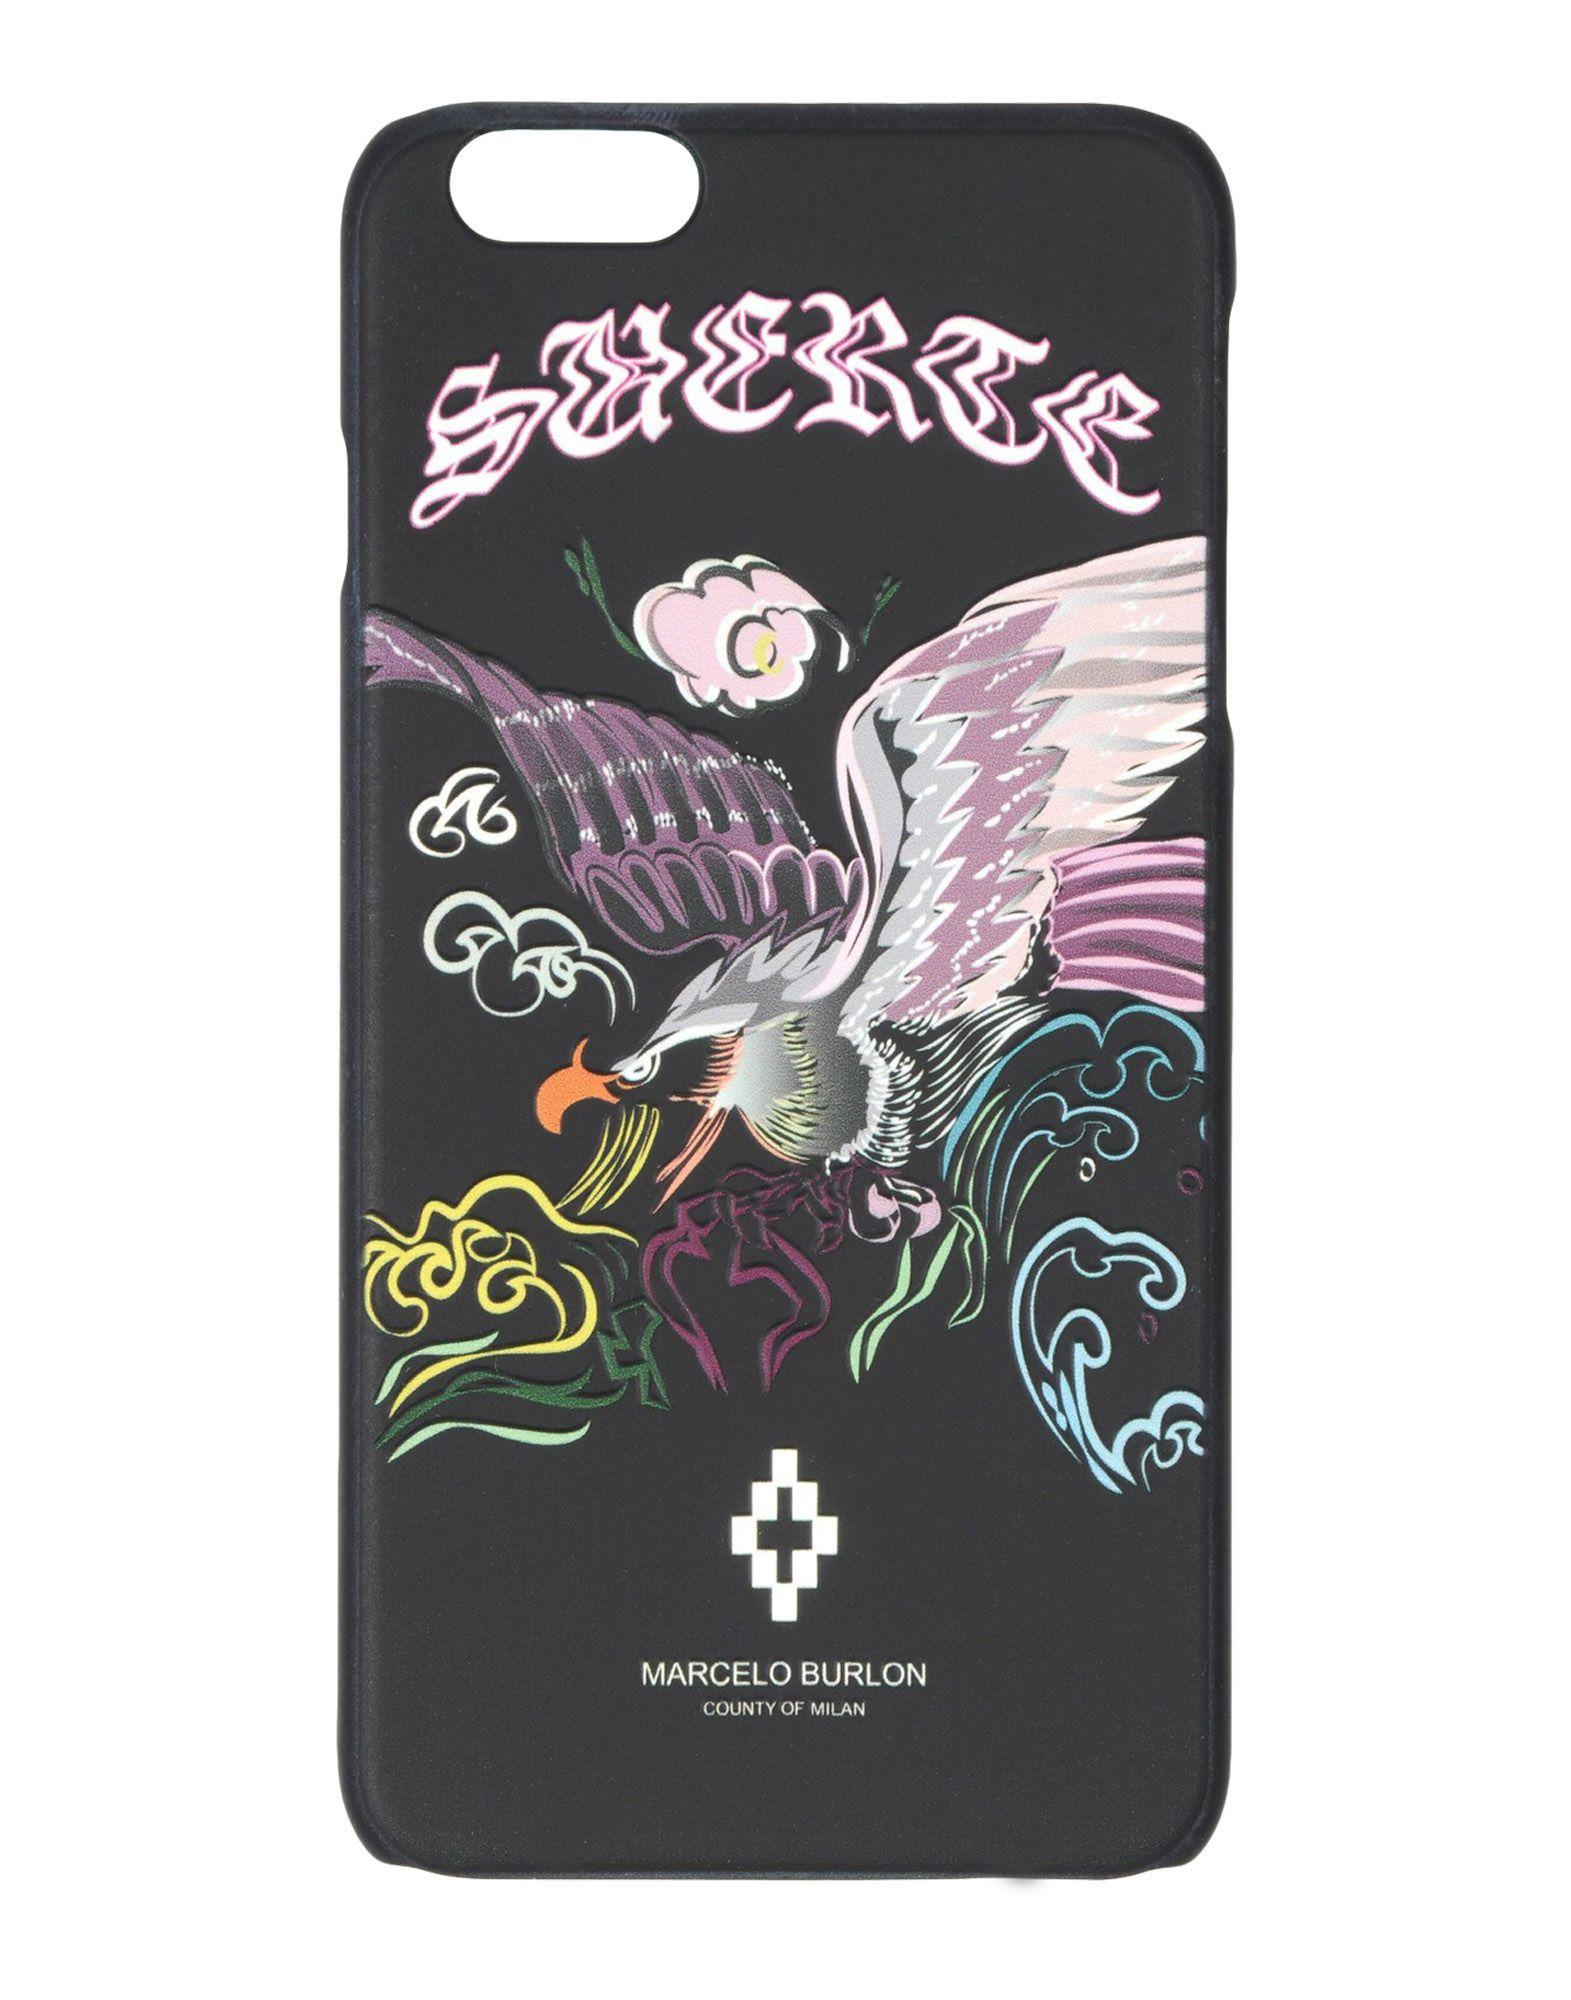 Фото - MARCELO BURLON Чехол чехол накладка для apple iphone 6 6s deppa gel plus case 85213 pink клип кейс полиуретан